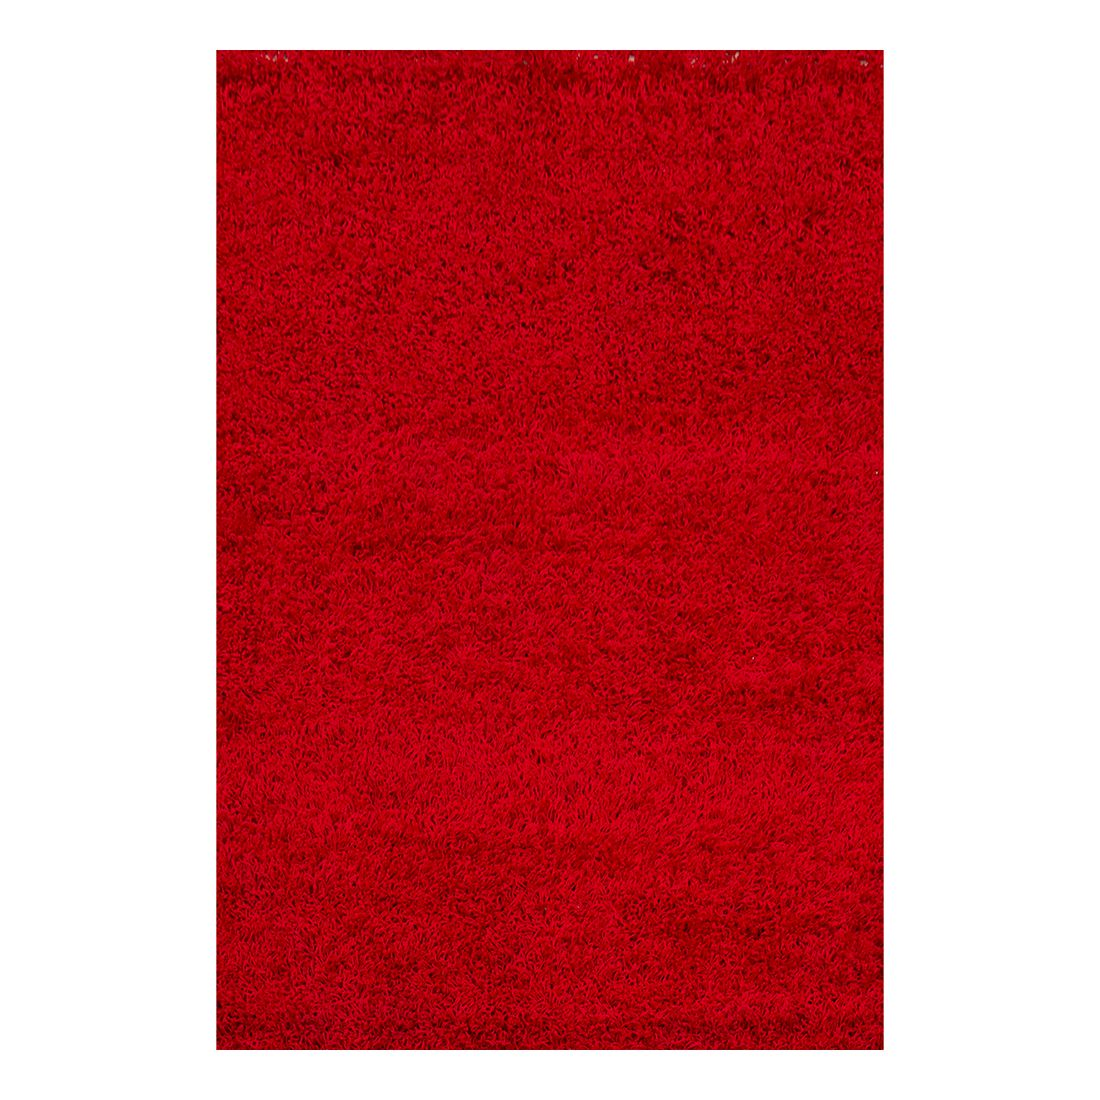 teppich oslo rot 140 x 200 cm kayoom g nstig bestellen. Black Bedroom Furniture Sets. Home Design Ideas